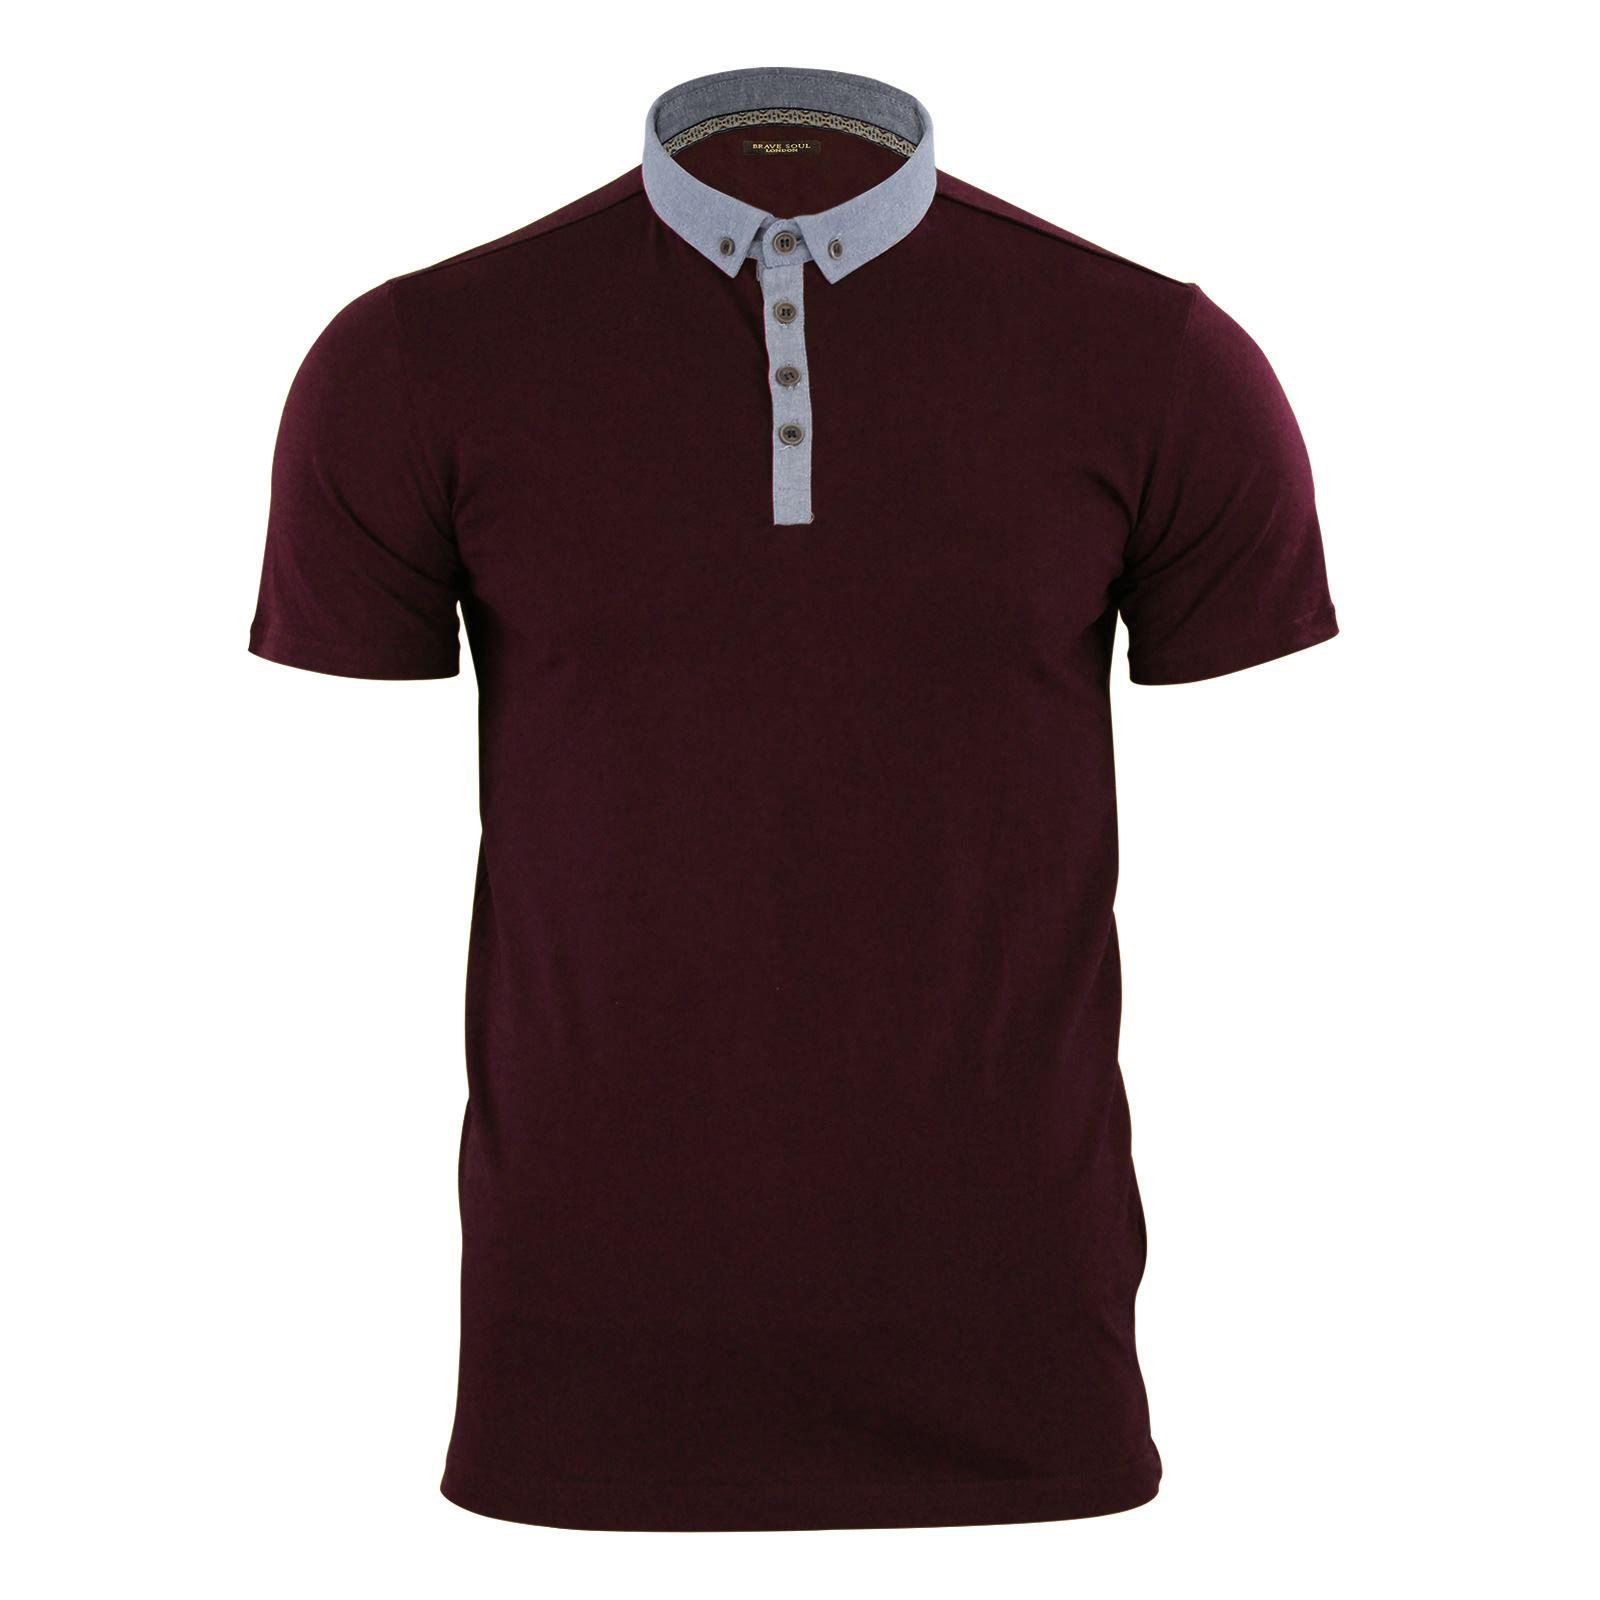 Para-Hombre-Polo-T-Shirt-Alma-valiente-Glover-Algodon-Con-Cuello-Y-Manga-Corta-Casual-Top miniatura 24